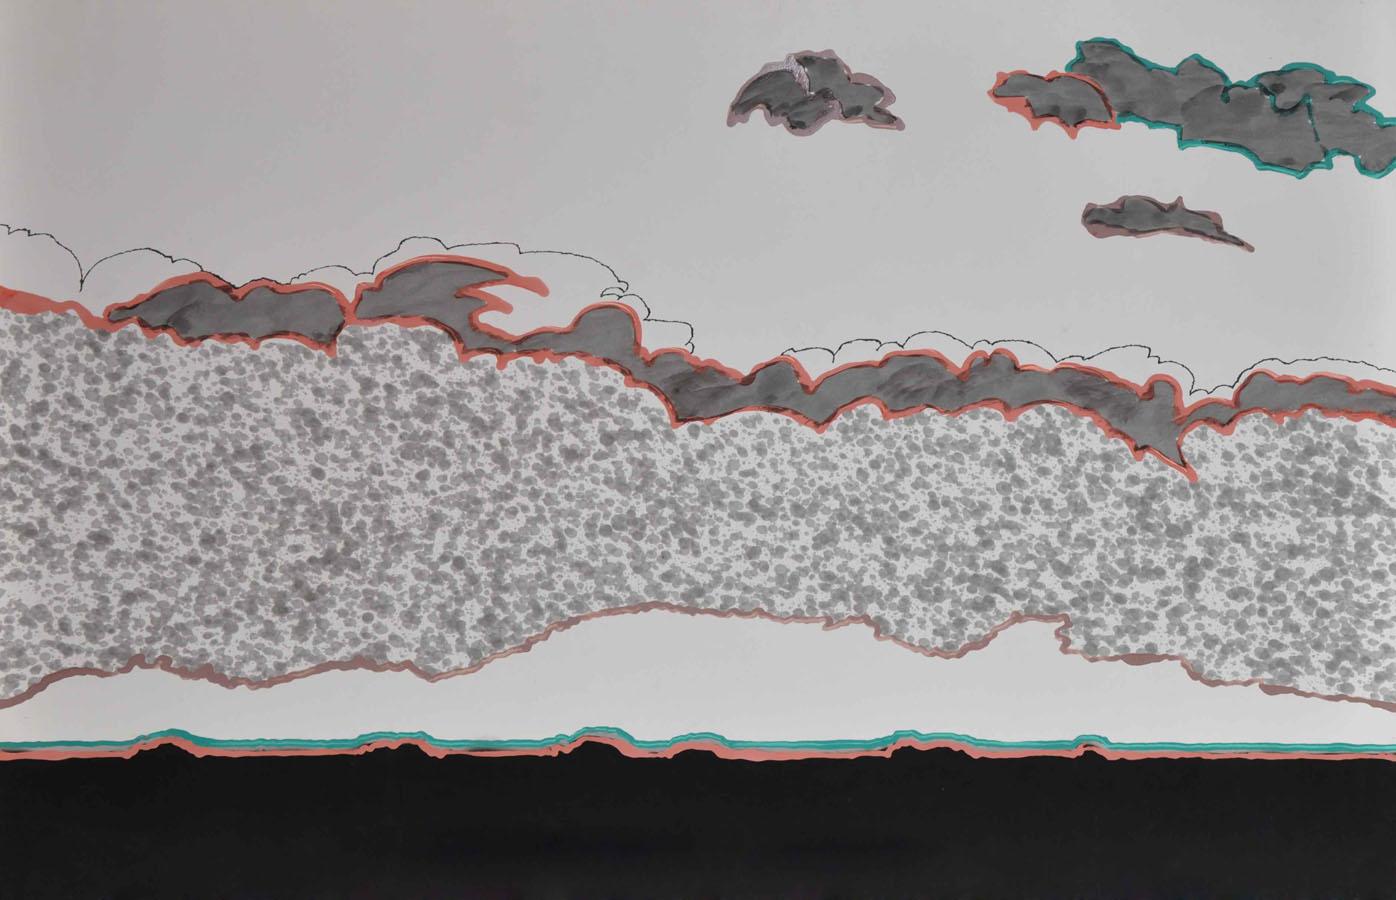 V.F. 1997. 60 x 90. Paper, inc, acrylic,blacklacquer.